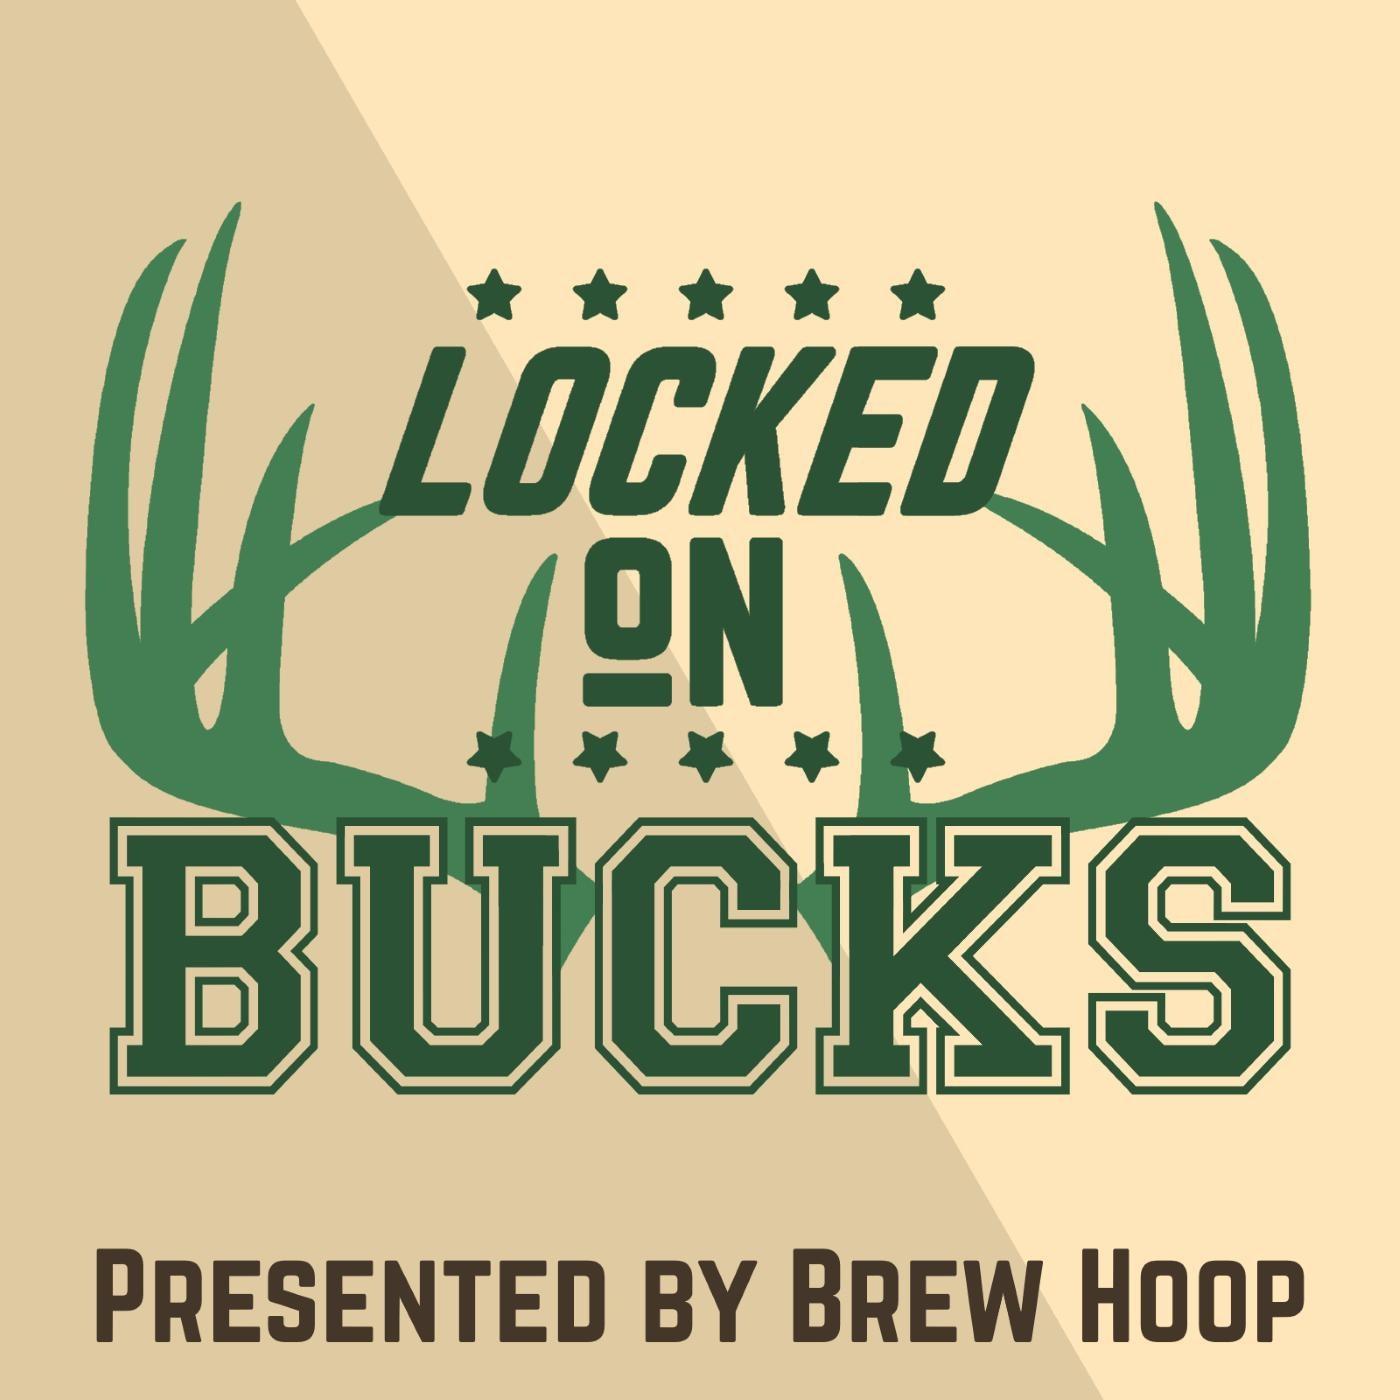 Locked on Bucks, 11/14/18: Is Giannis Antetokounmpo somehow struggling? (Ep #502) by Locked on Bucks